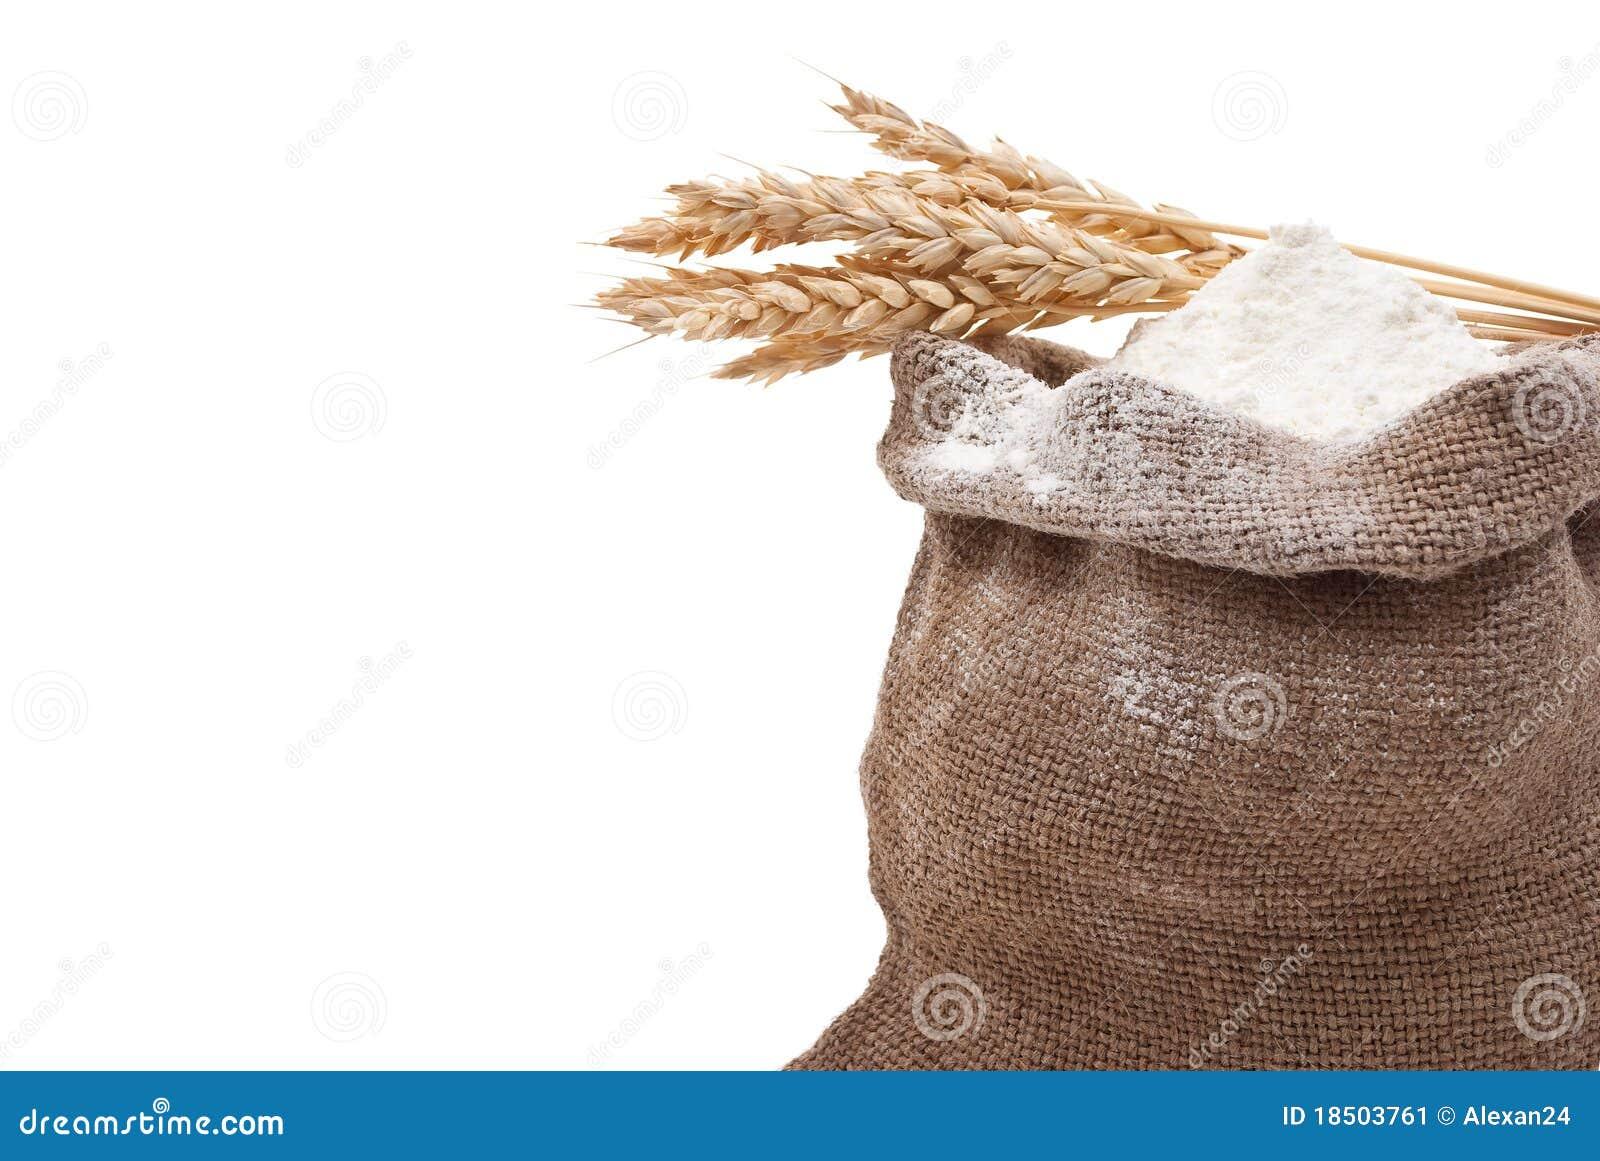 how to use whole wheat flour